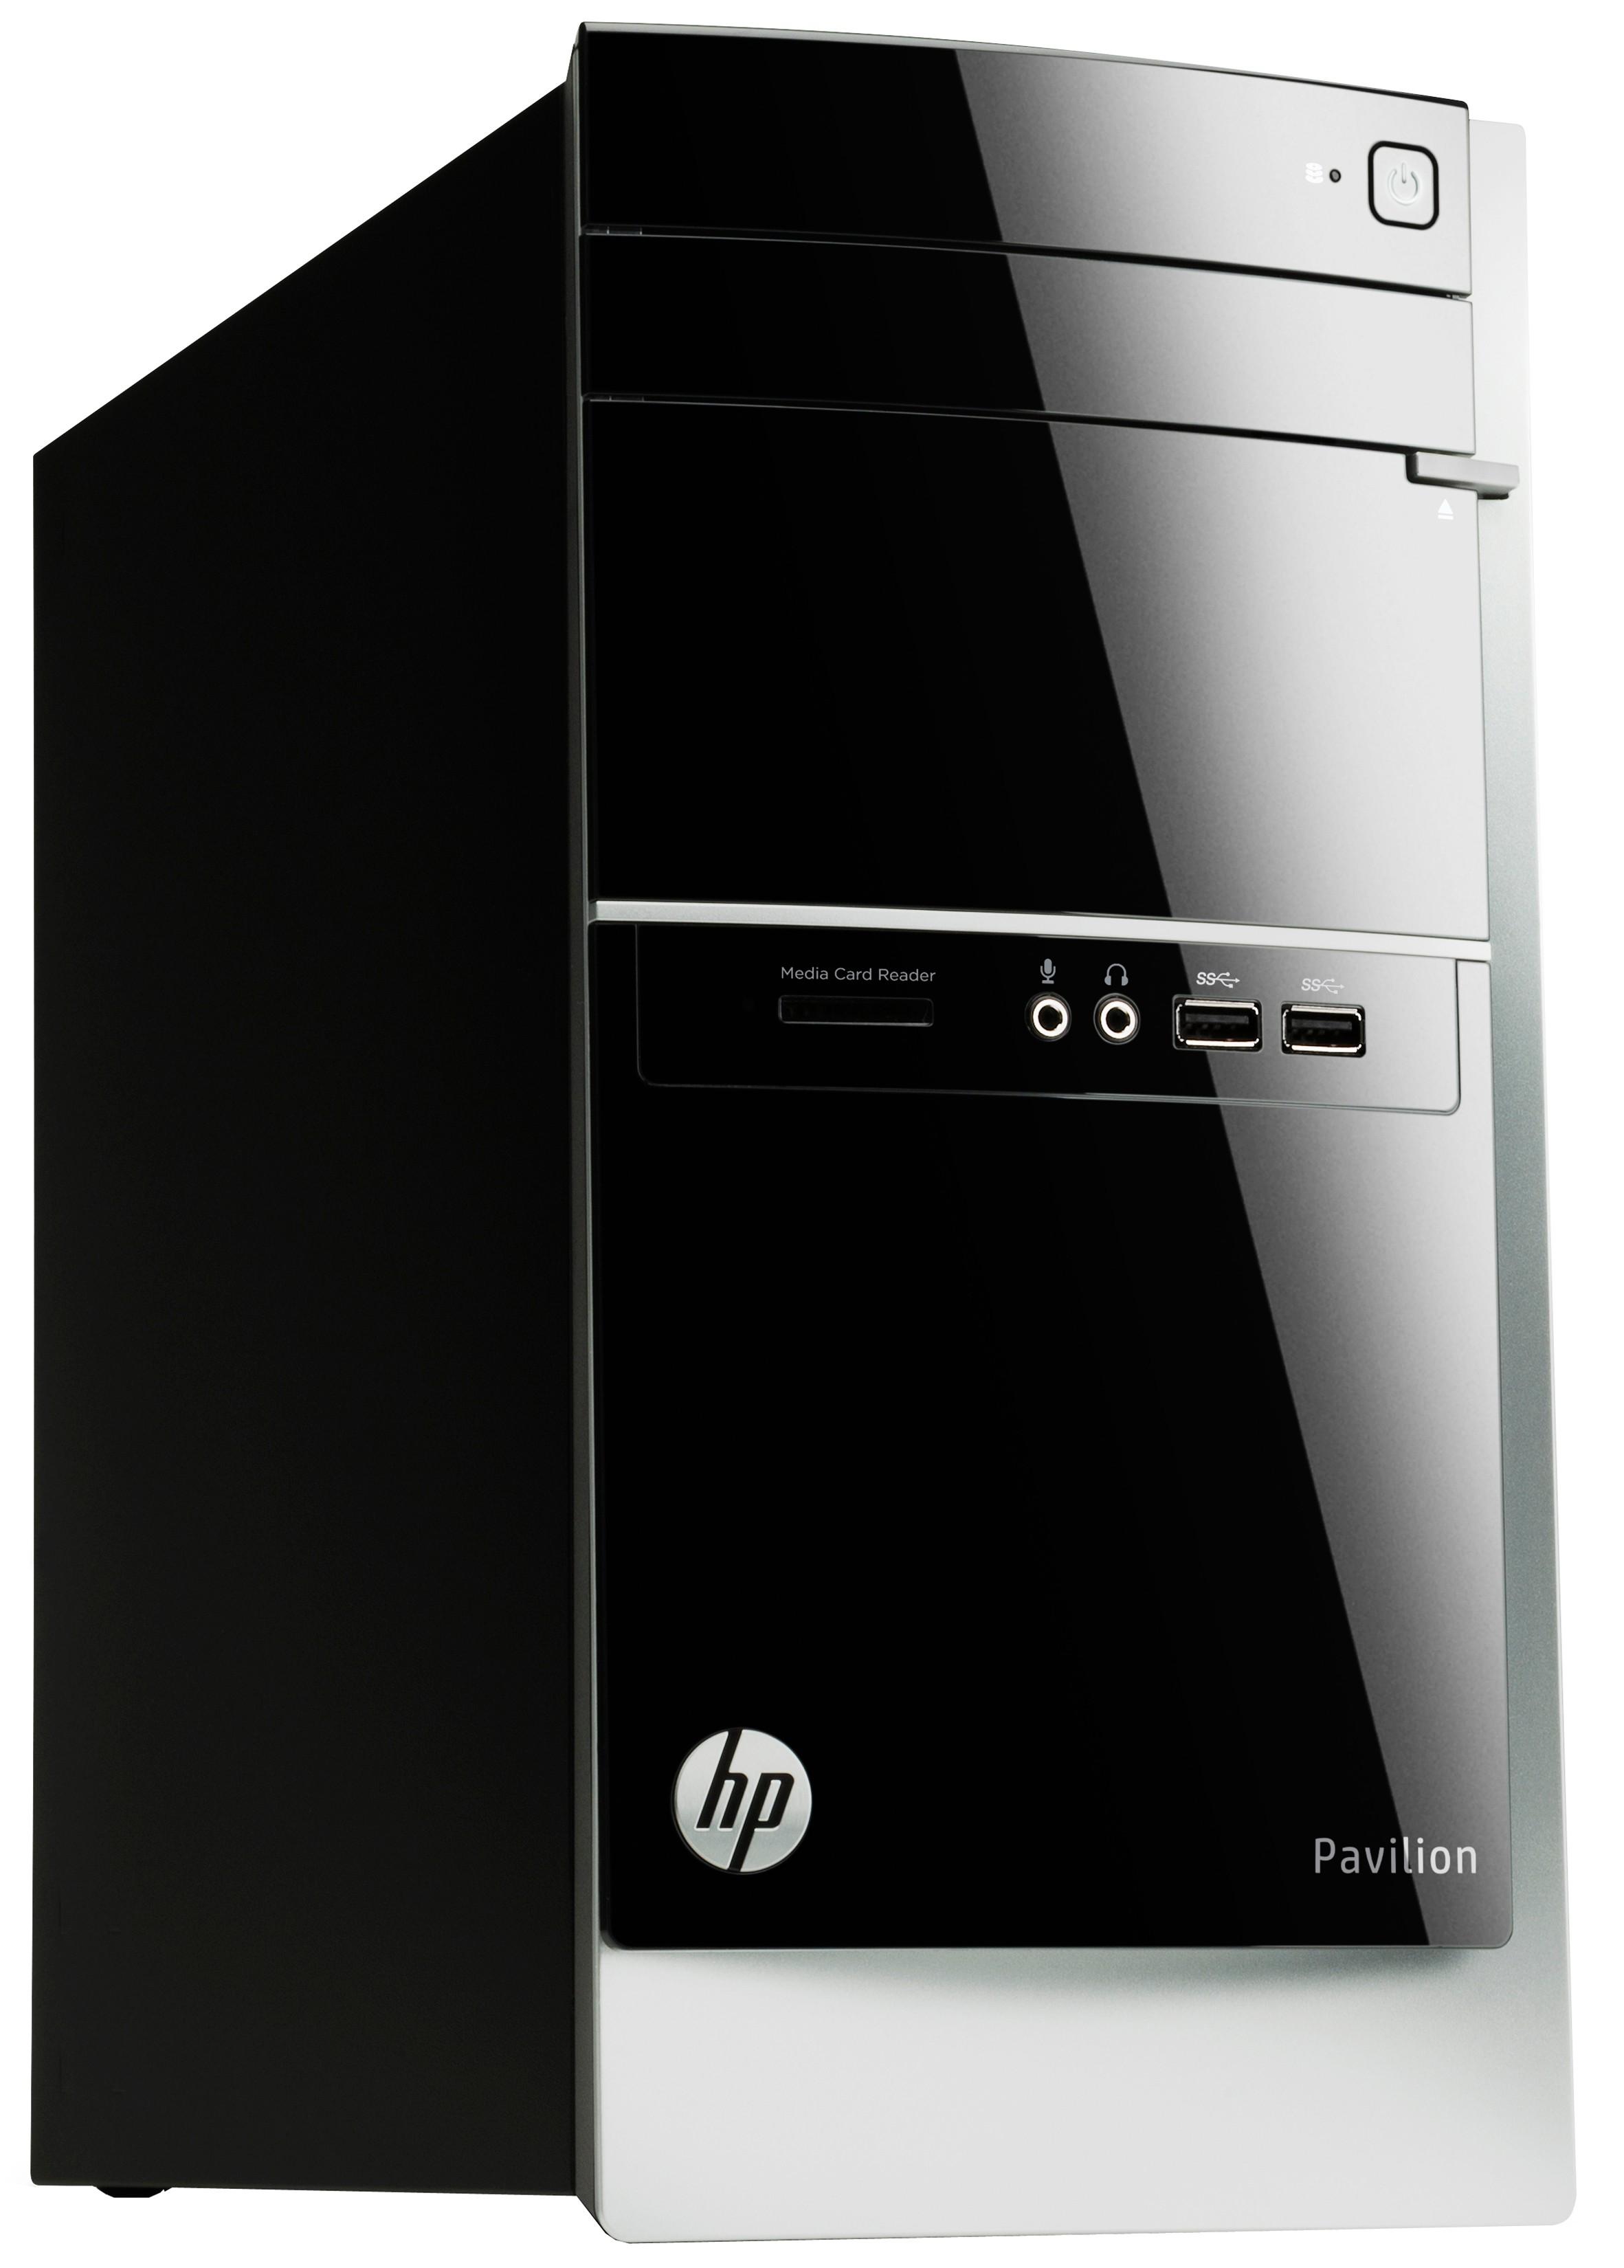 F9P08EA#UUW : HP Pavilion 500-205eo stasjonær PC